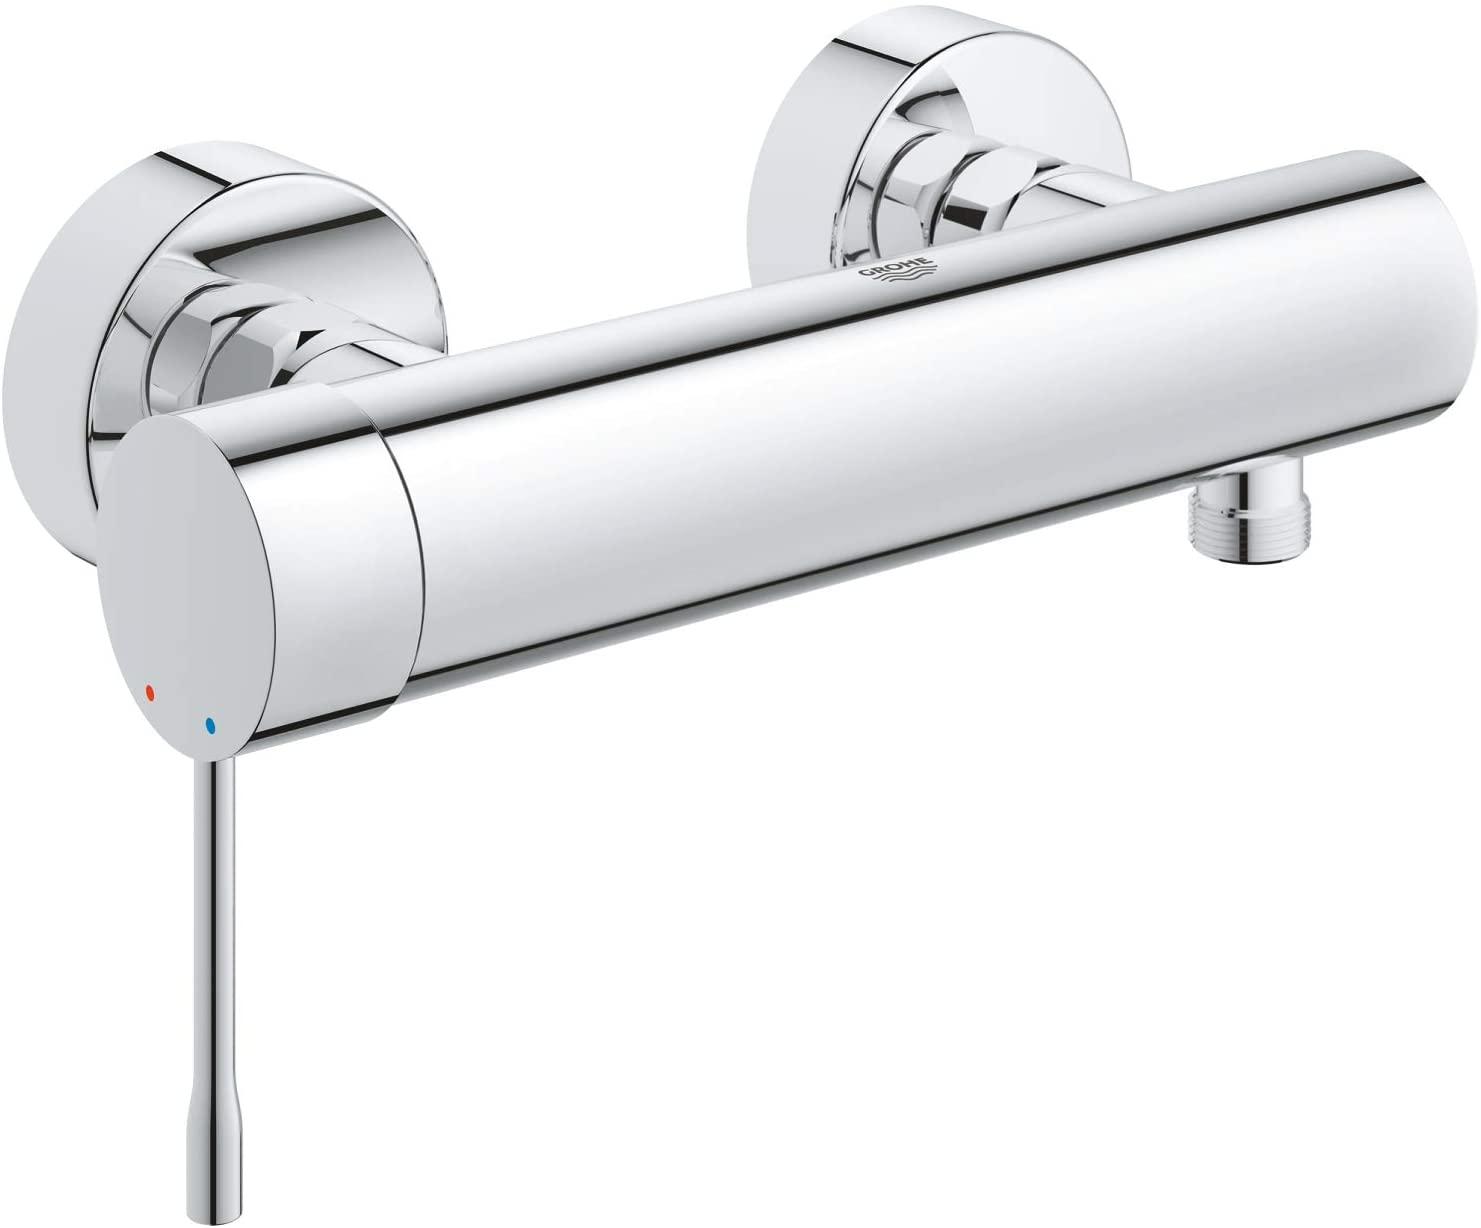 Grifo de ducha Termostático Grohe Essence